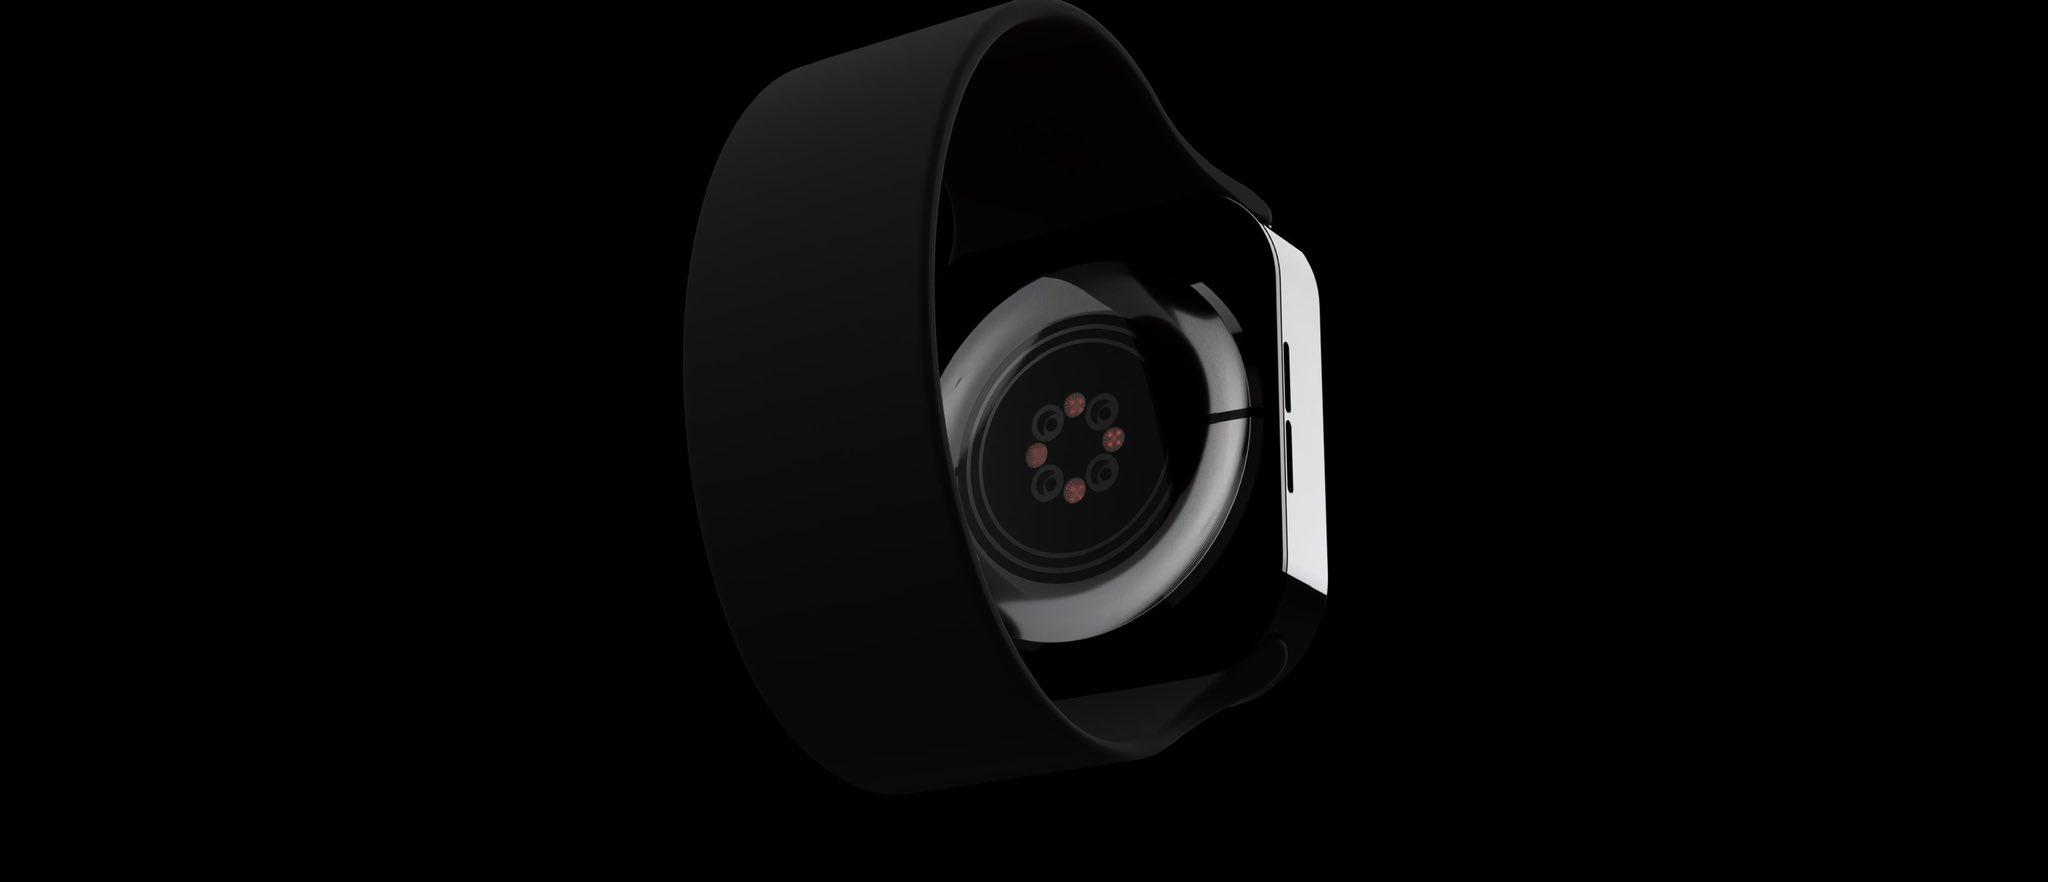 Apple Watch Series 7是什么?长什么样?或是这样好看吗?